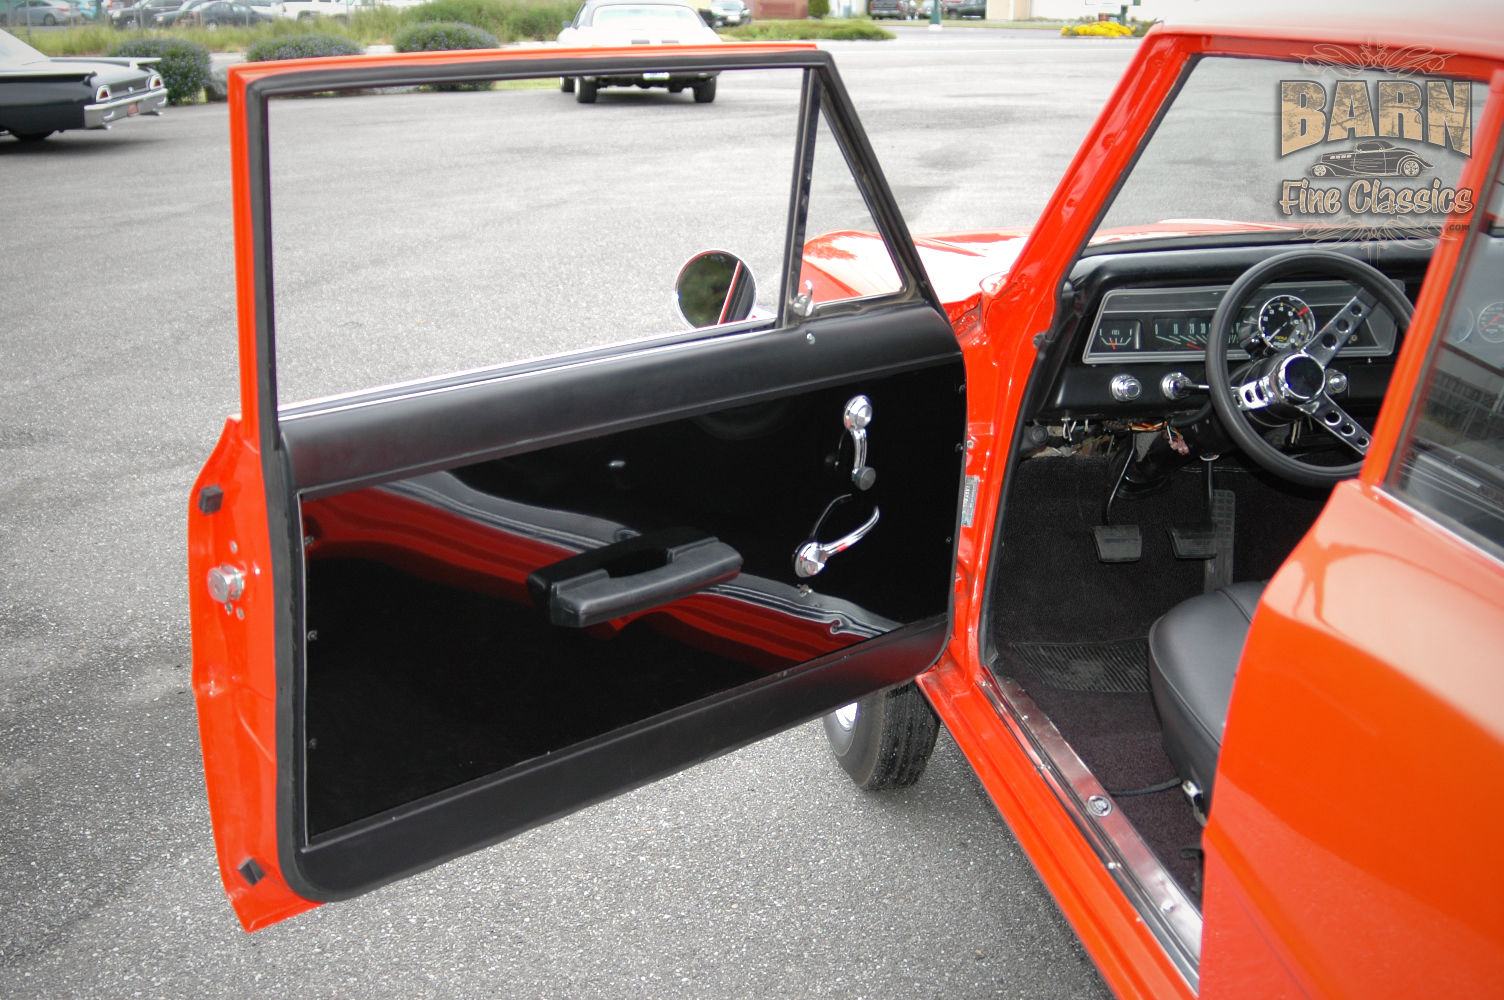 1967 chevrolet nova gasser 350 v8 5 speed manual trans full custom build. Black Bedroom Furniture Sets. Home Design Ideas